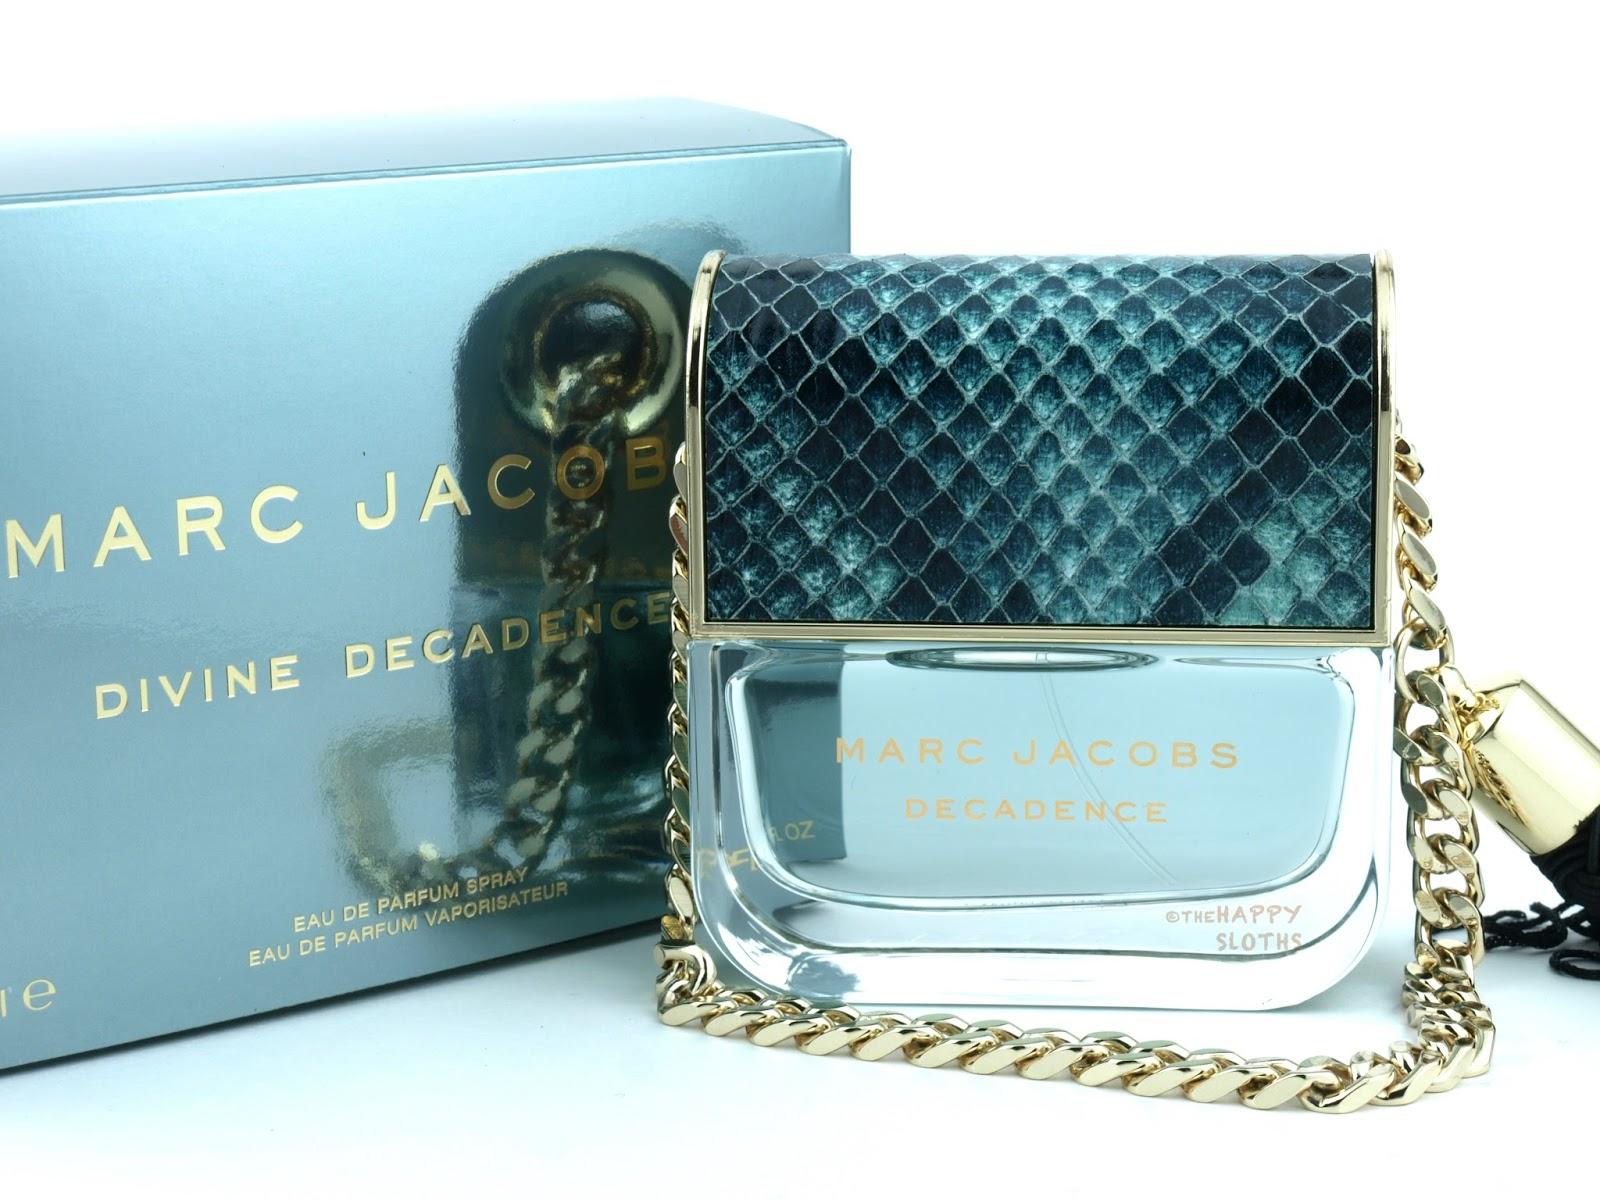 fc3b71a3e632b1 Marc Jacobs Divine Decadence Eau de Parfum  Review